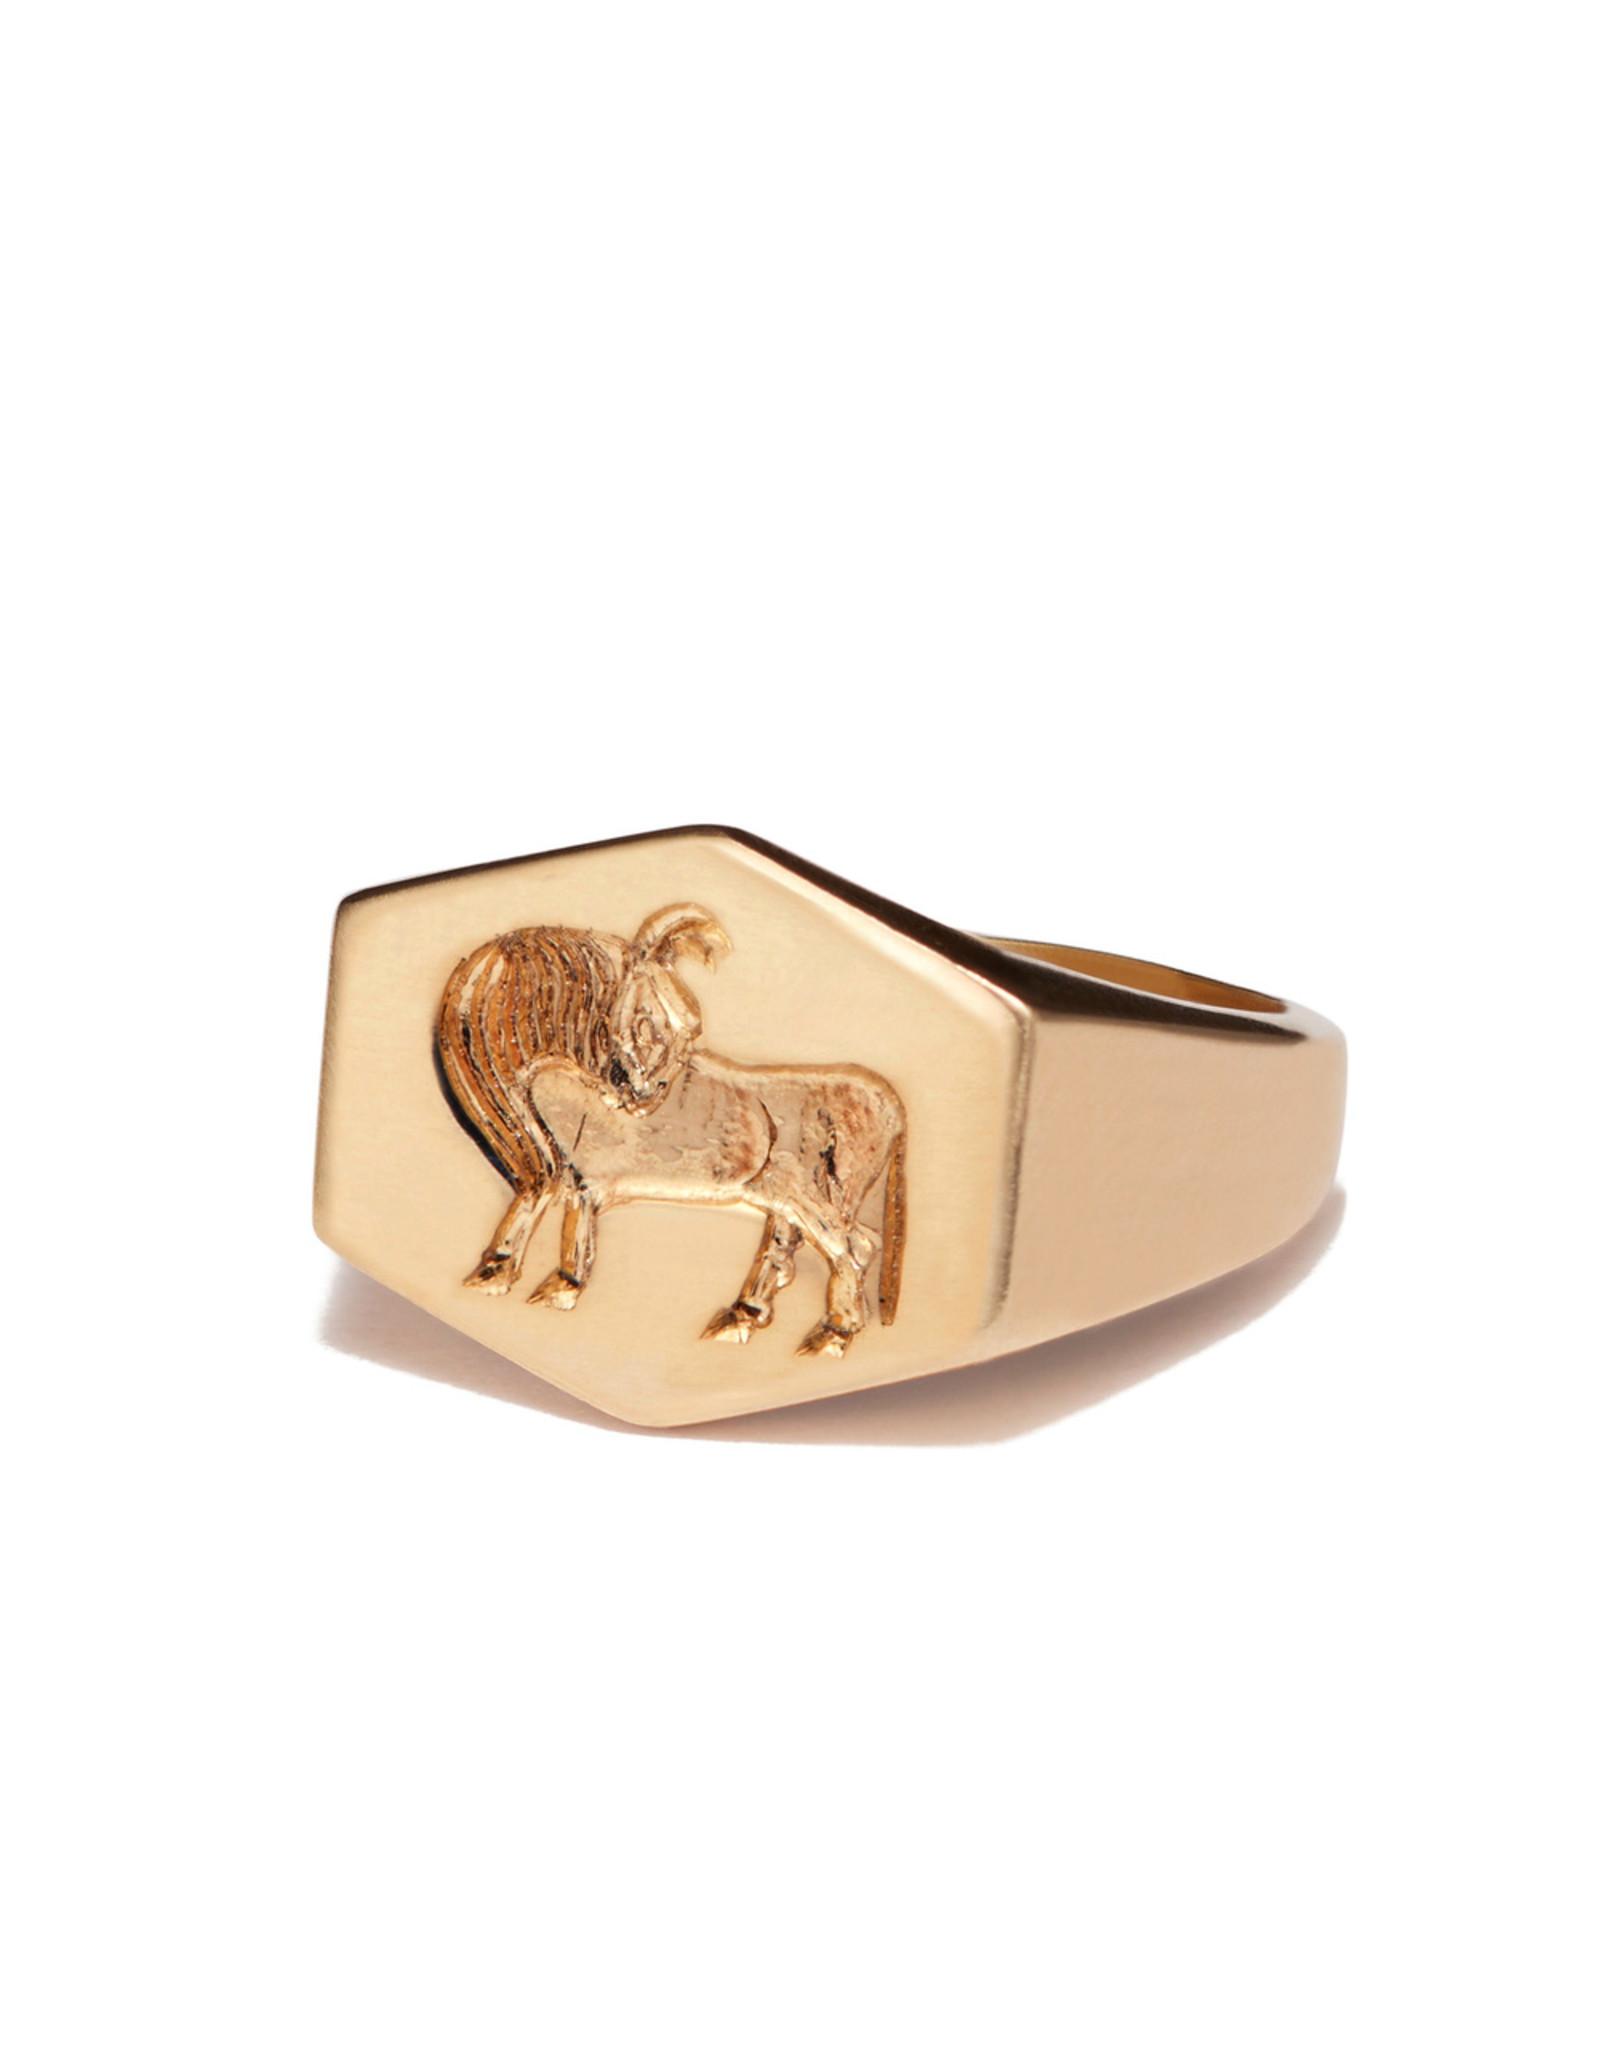 Kim Dunham Kim Dunham Zodiac Sign Gold Rings (Size: 7, Zodiac Sign: Taurus, Color: Yellow Gold)